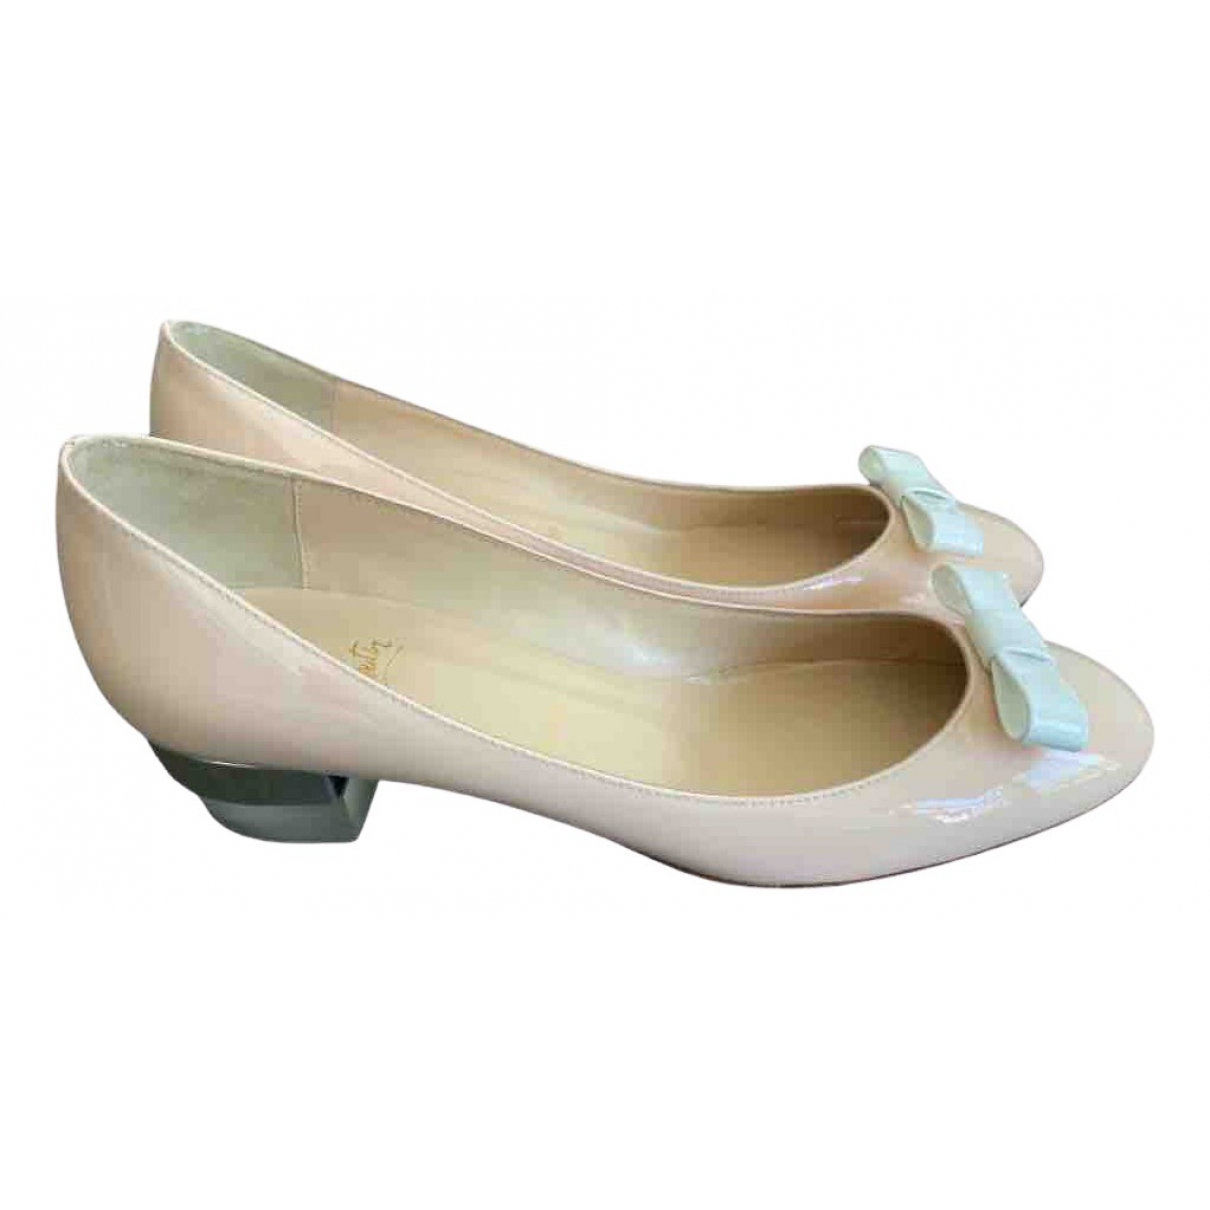 Christian Louboutin \N Beige Patent leather Ballet flats for Women 41 EU